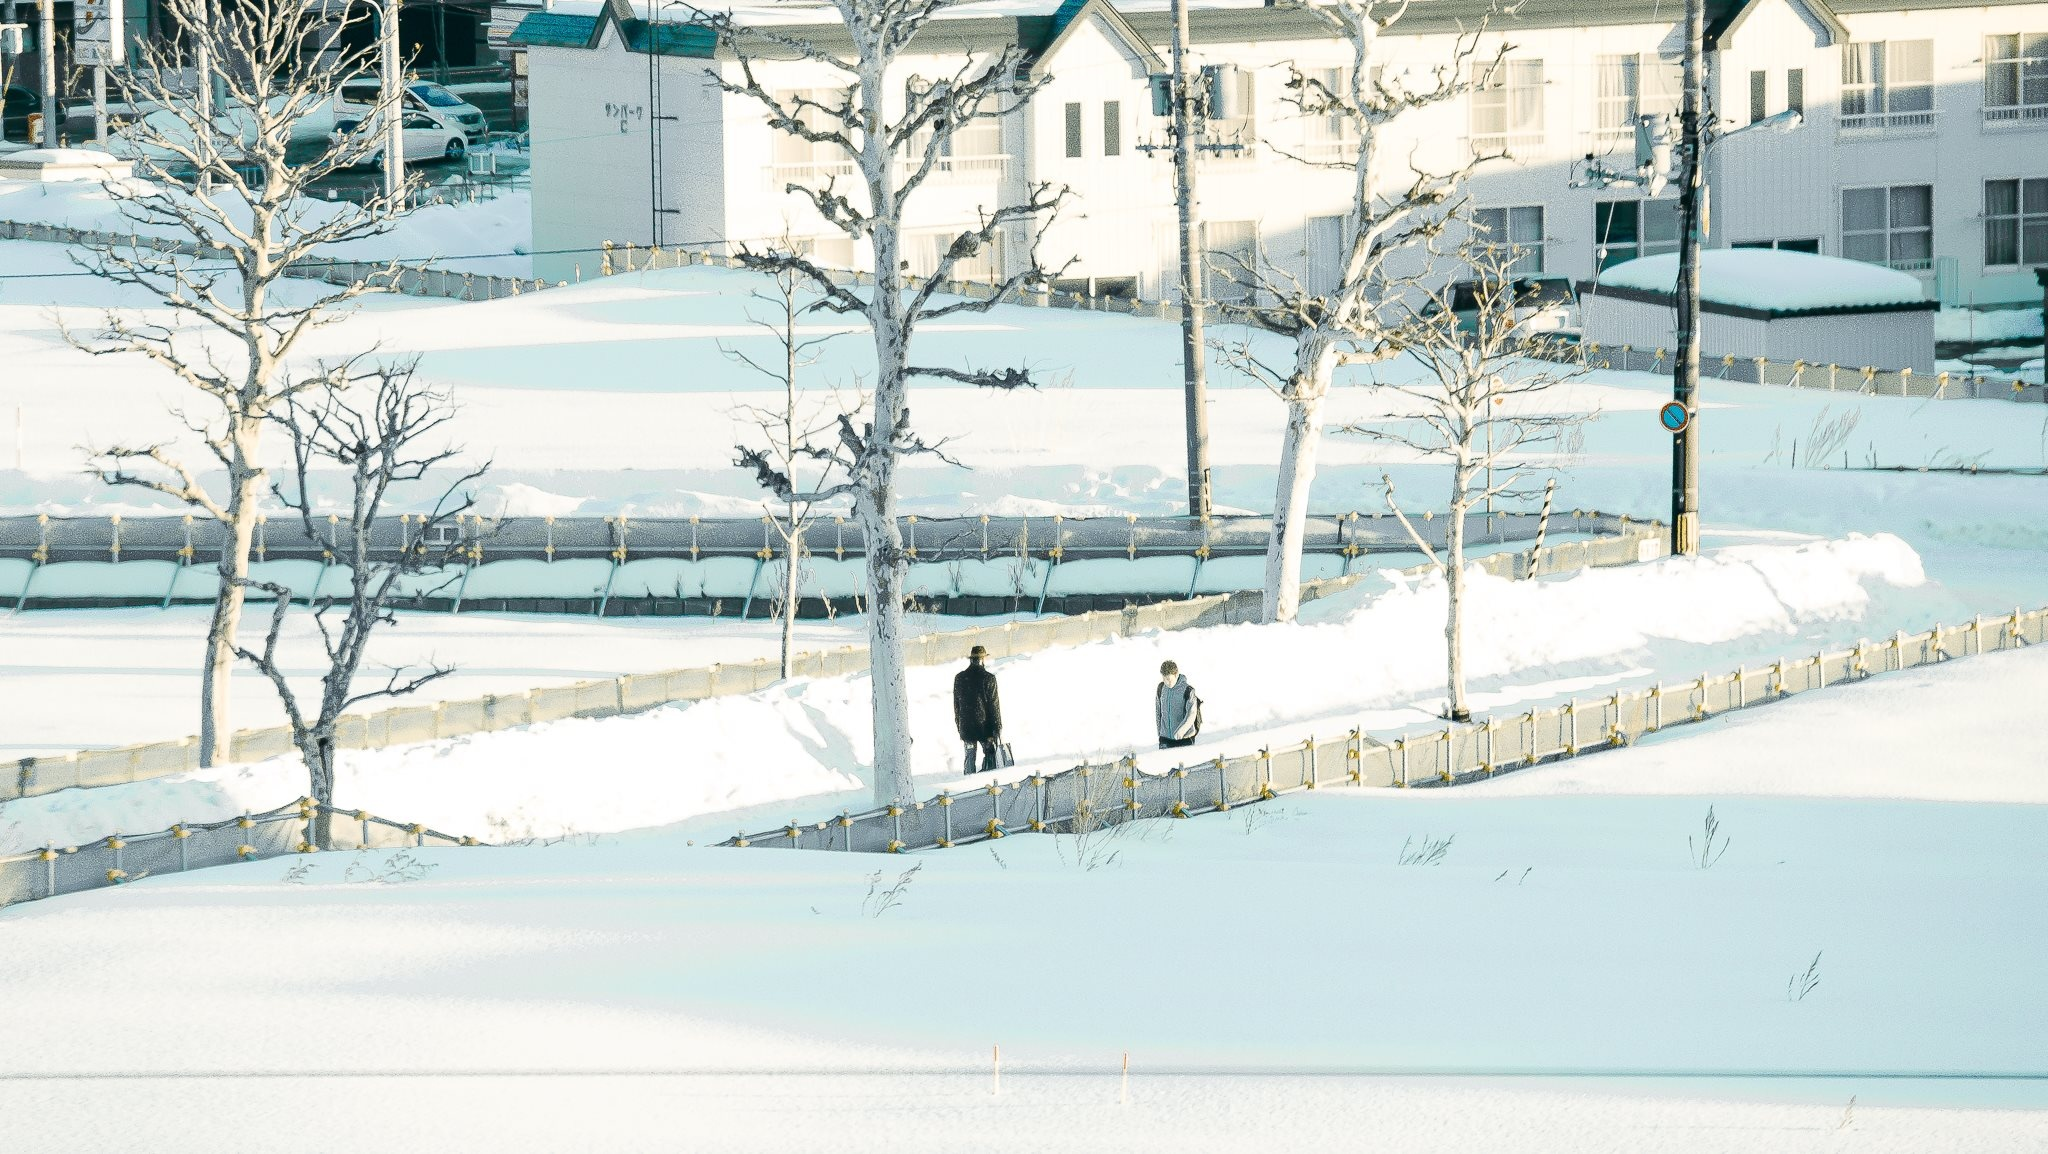 Hokkaido tuyet trang, noi dang den nhat mua dong o Nhat Ban hinh anh 28